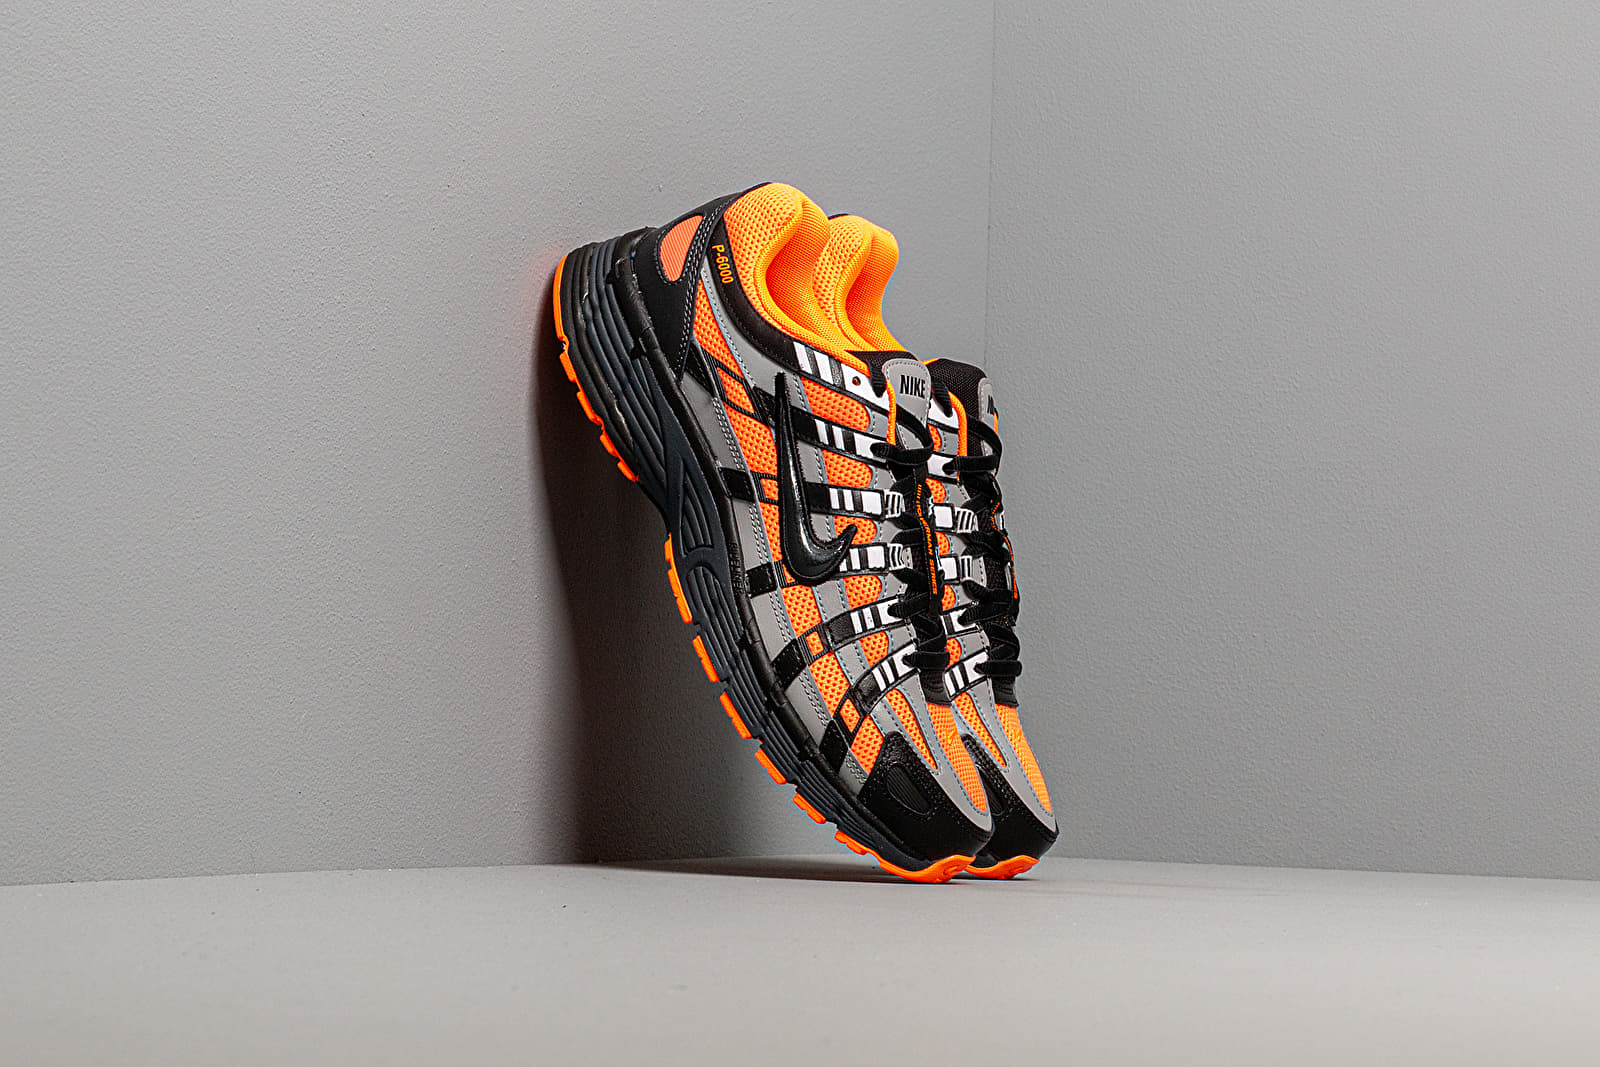 Chaussures et baskets homme Nike P-6000 Total Orange/ Black-Anthracite-Flt Silver